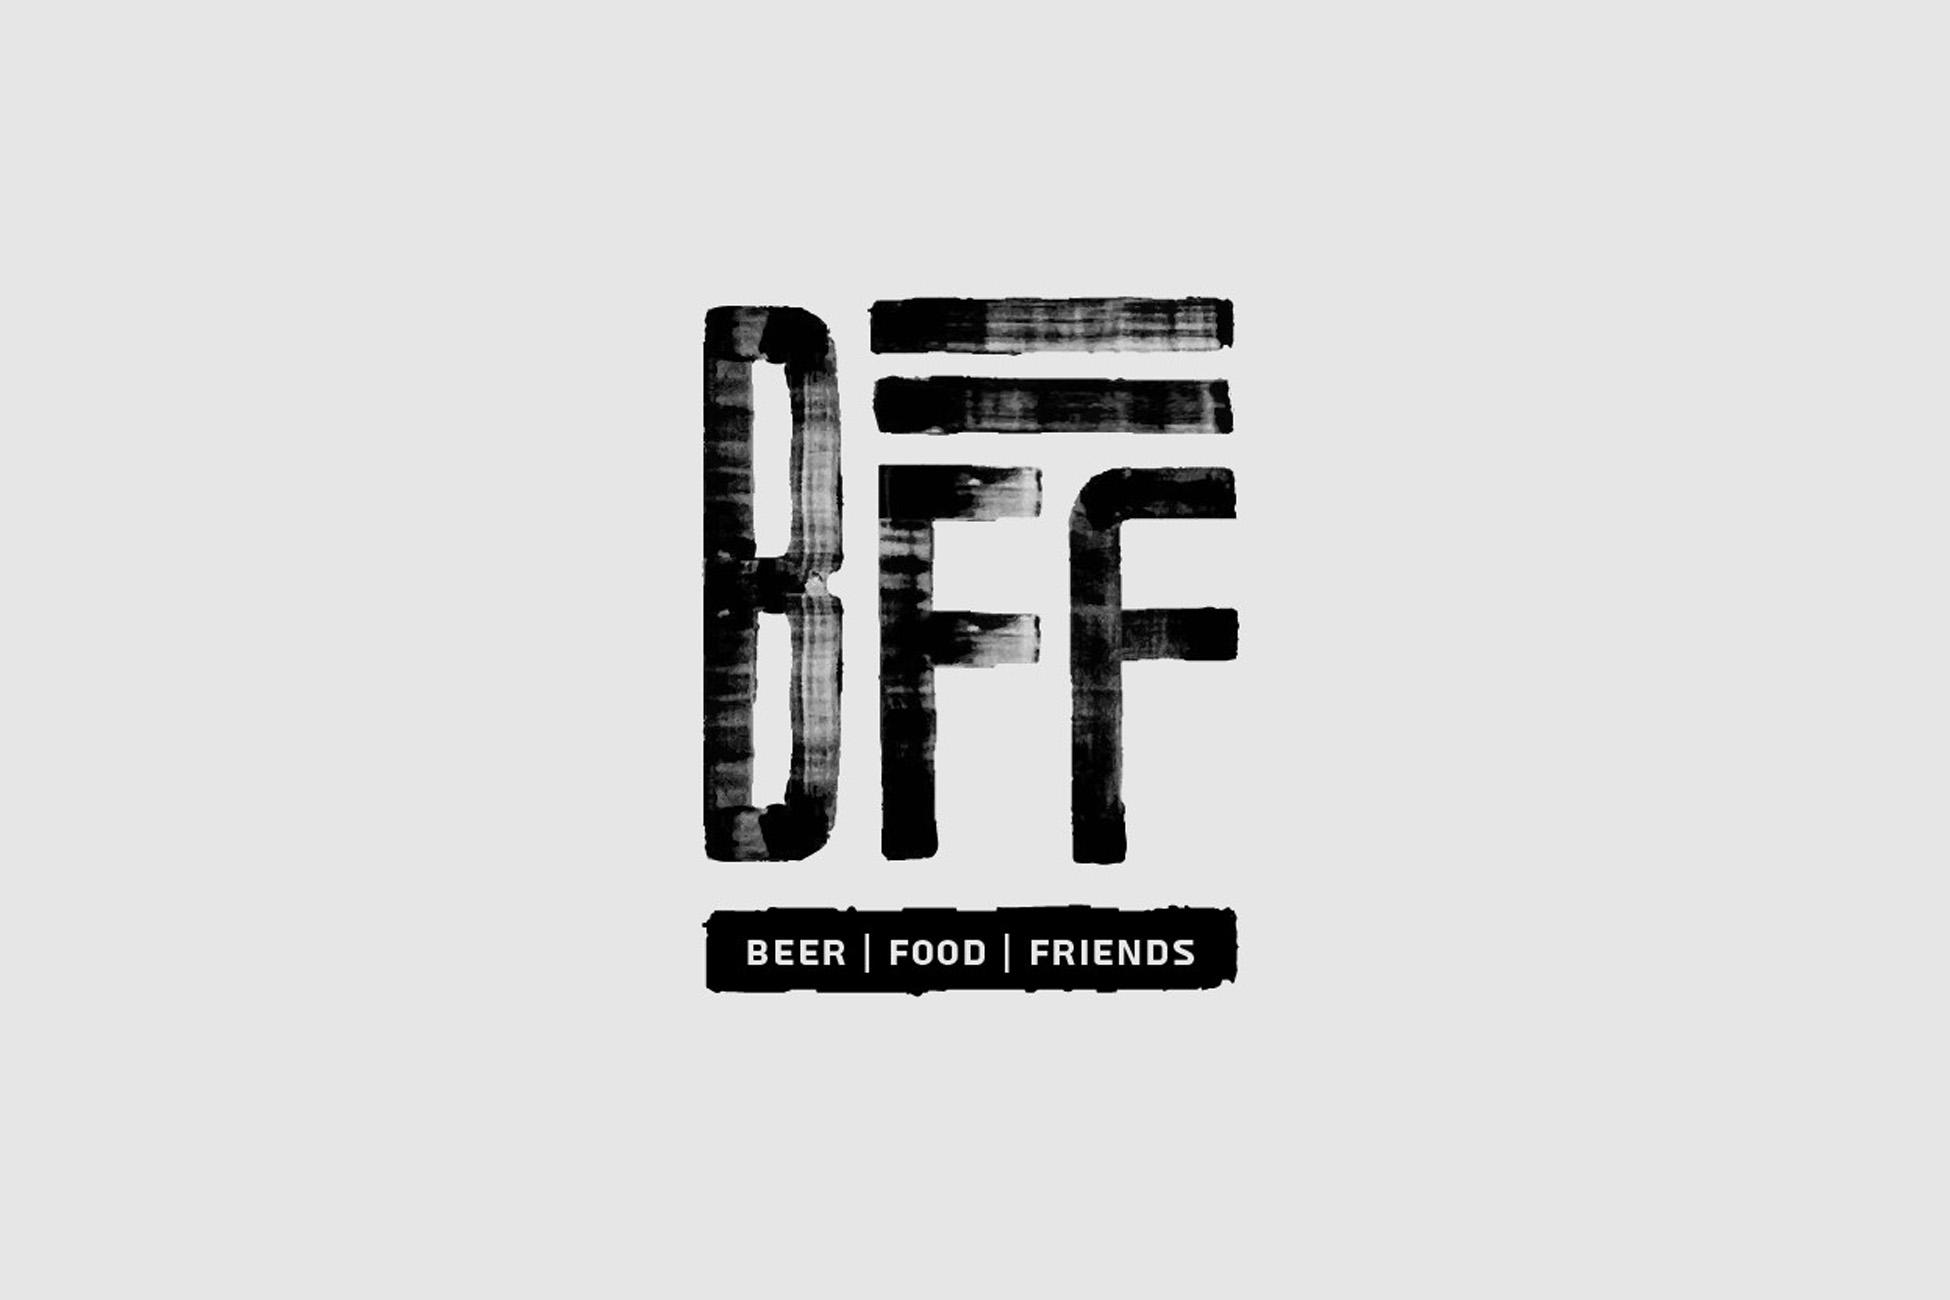 01_BFF.jpg